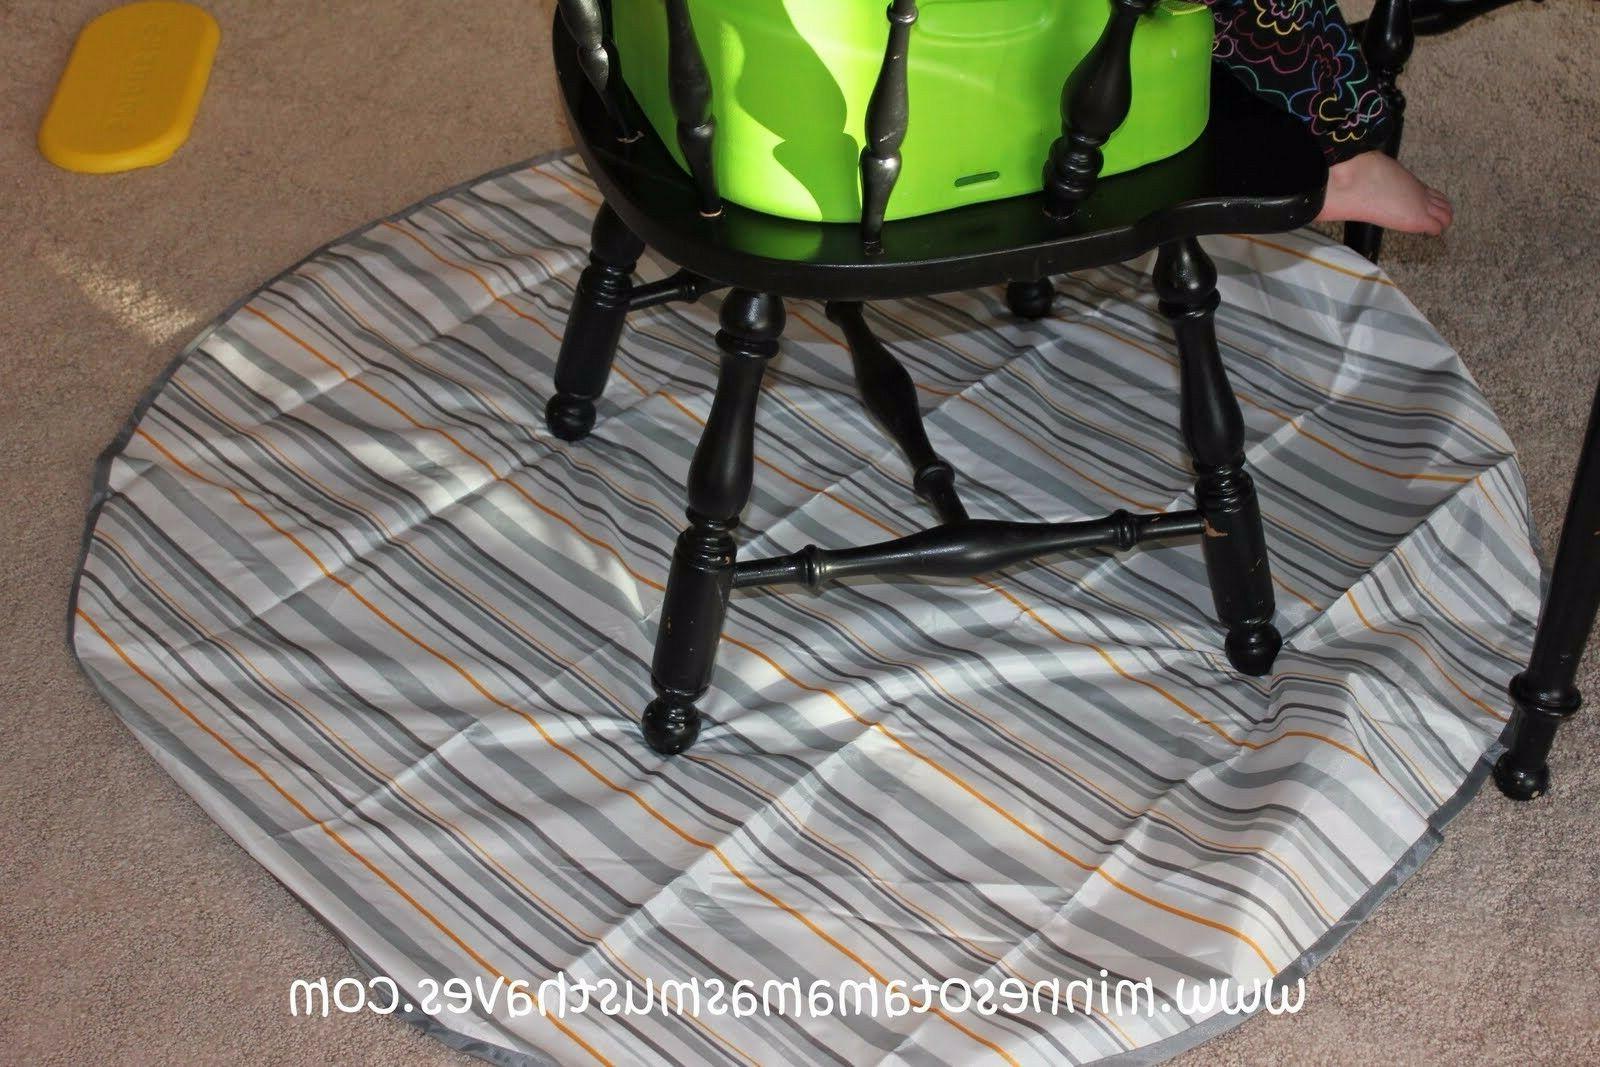 Prince Lionheart Catch All Multi-Use Floor Mat Highchair, Crafts etc